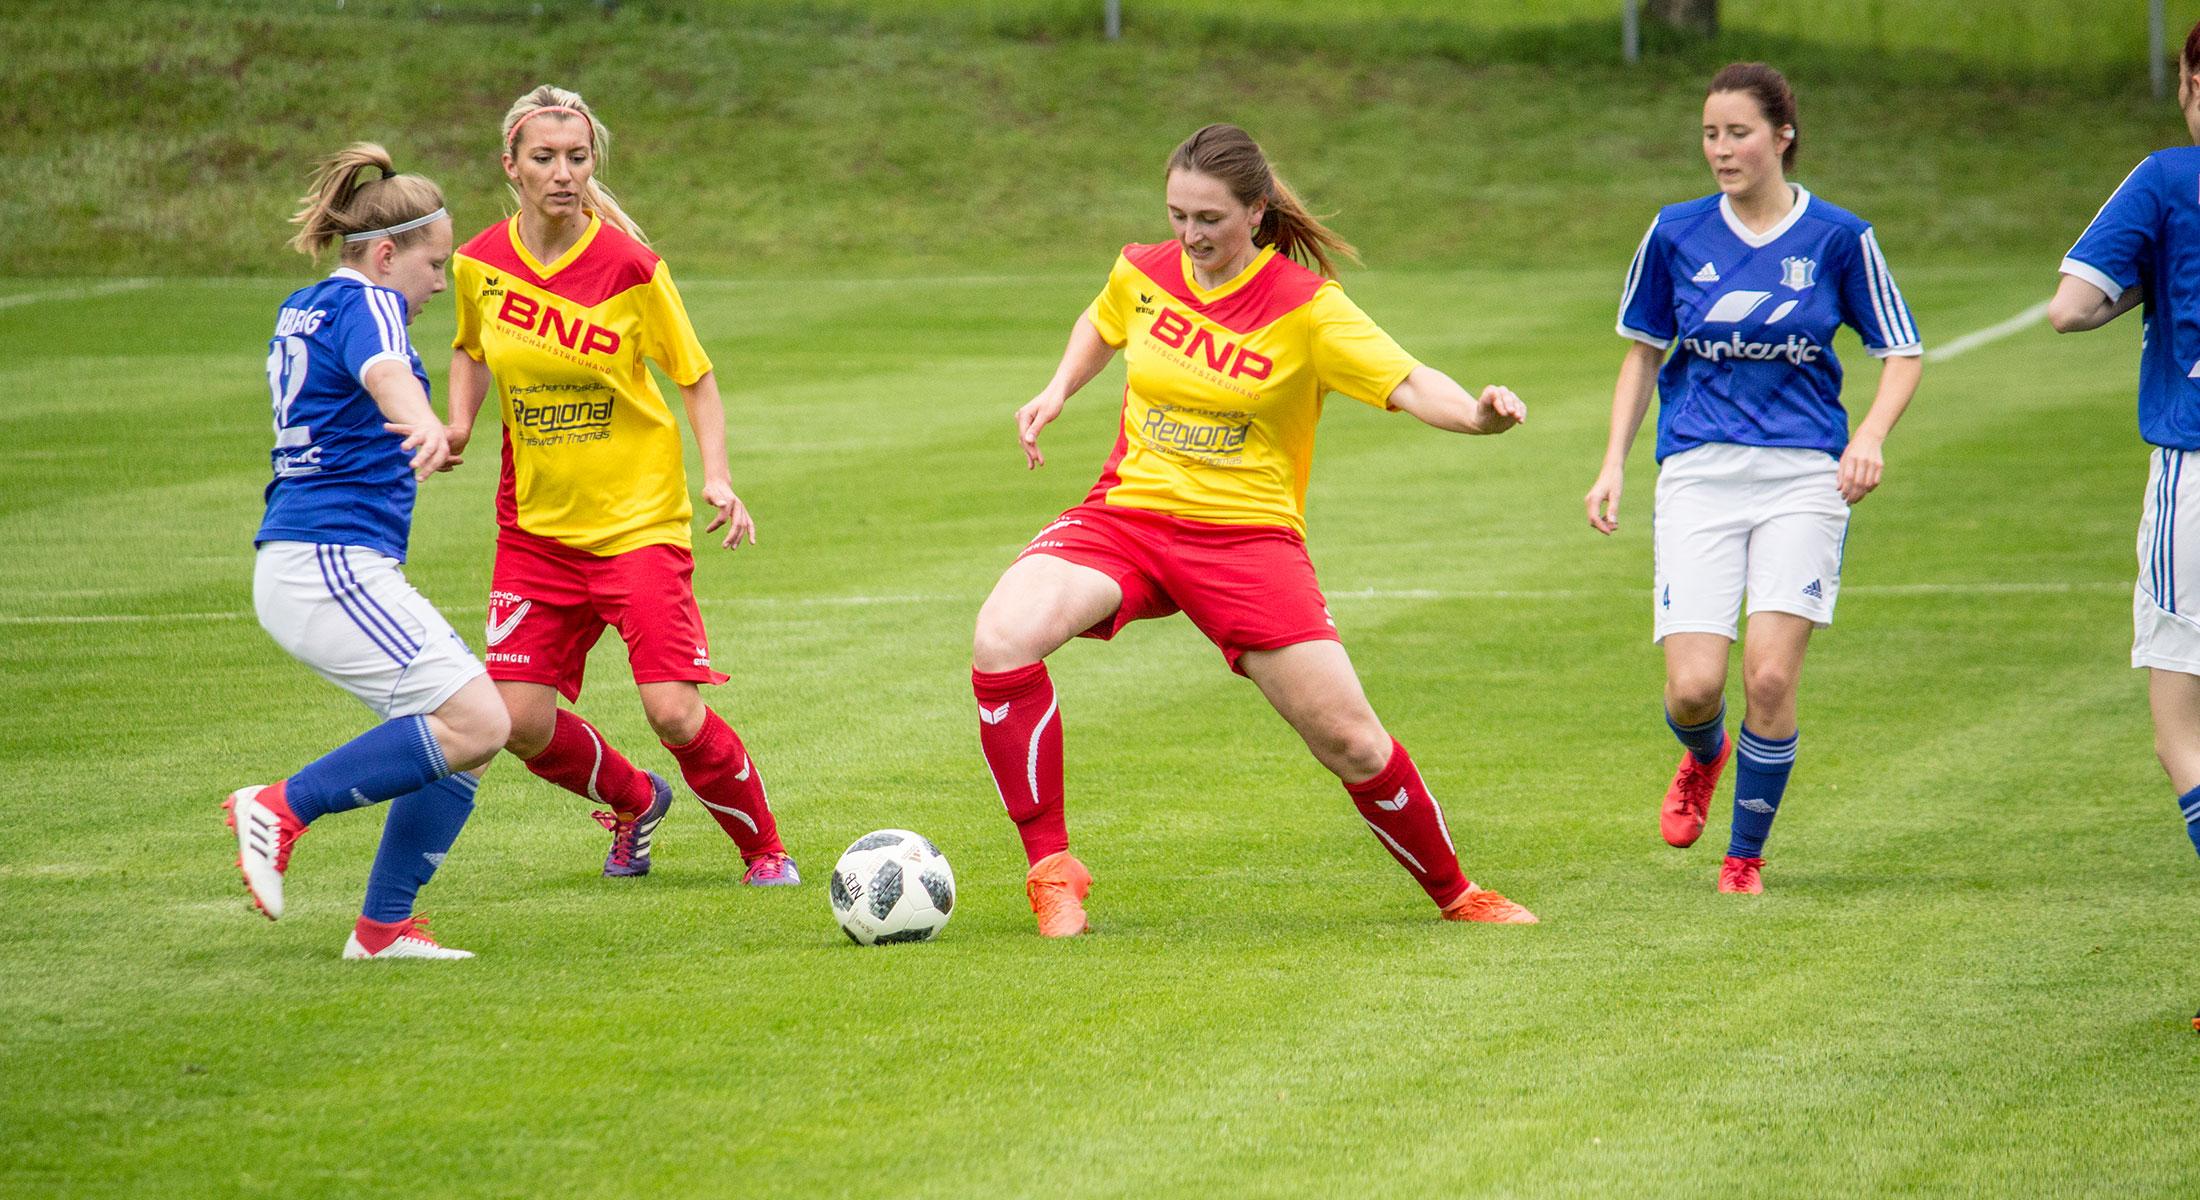 Erste Saison Landesliga abgeschlossen